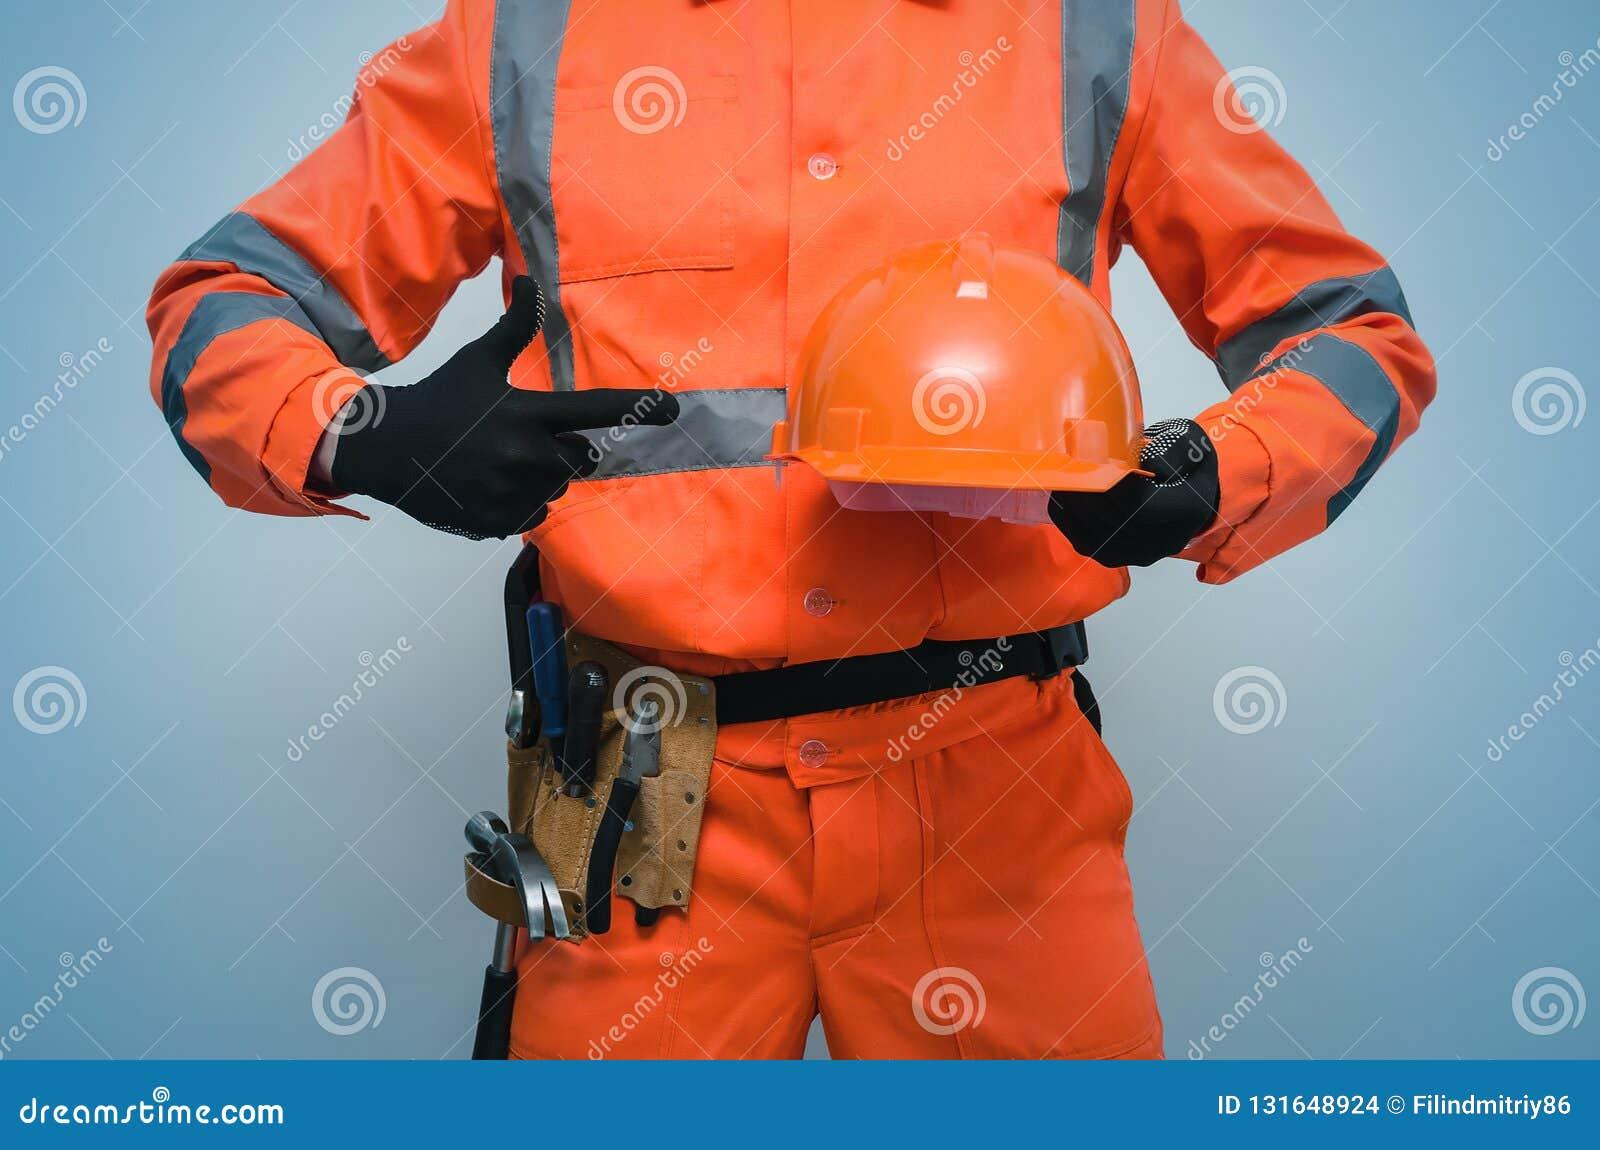 Builder. Worker. Repairman.